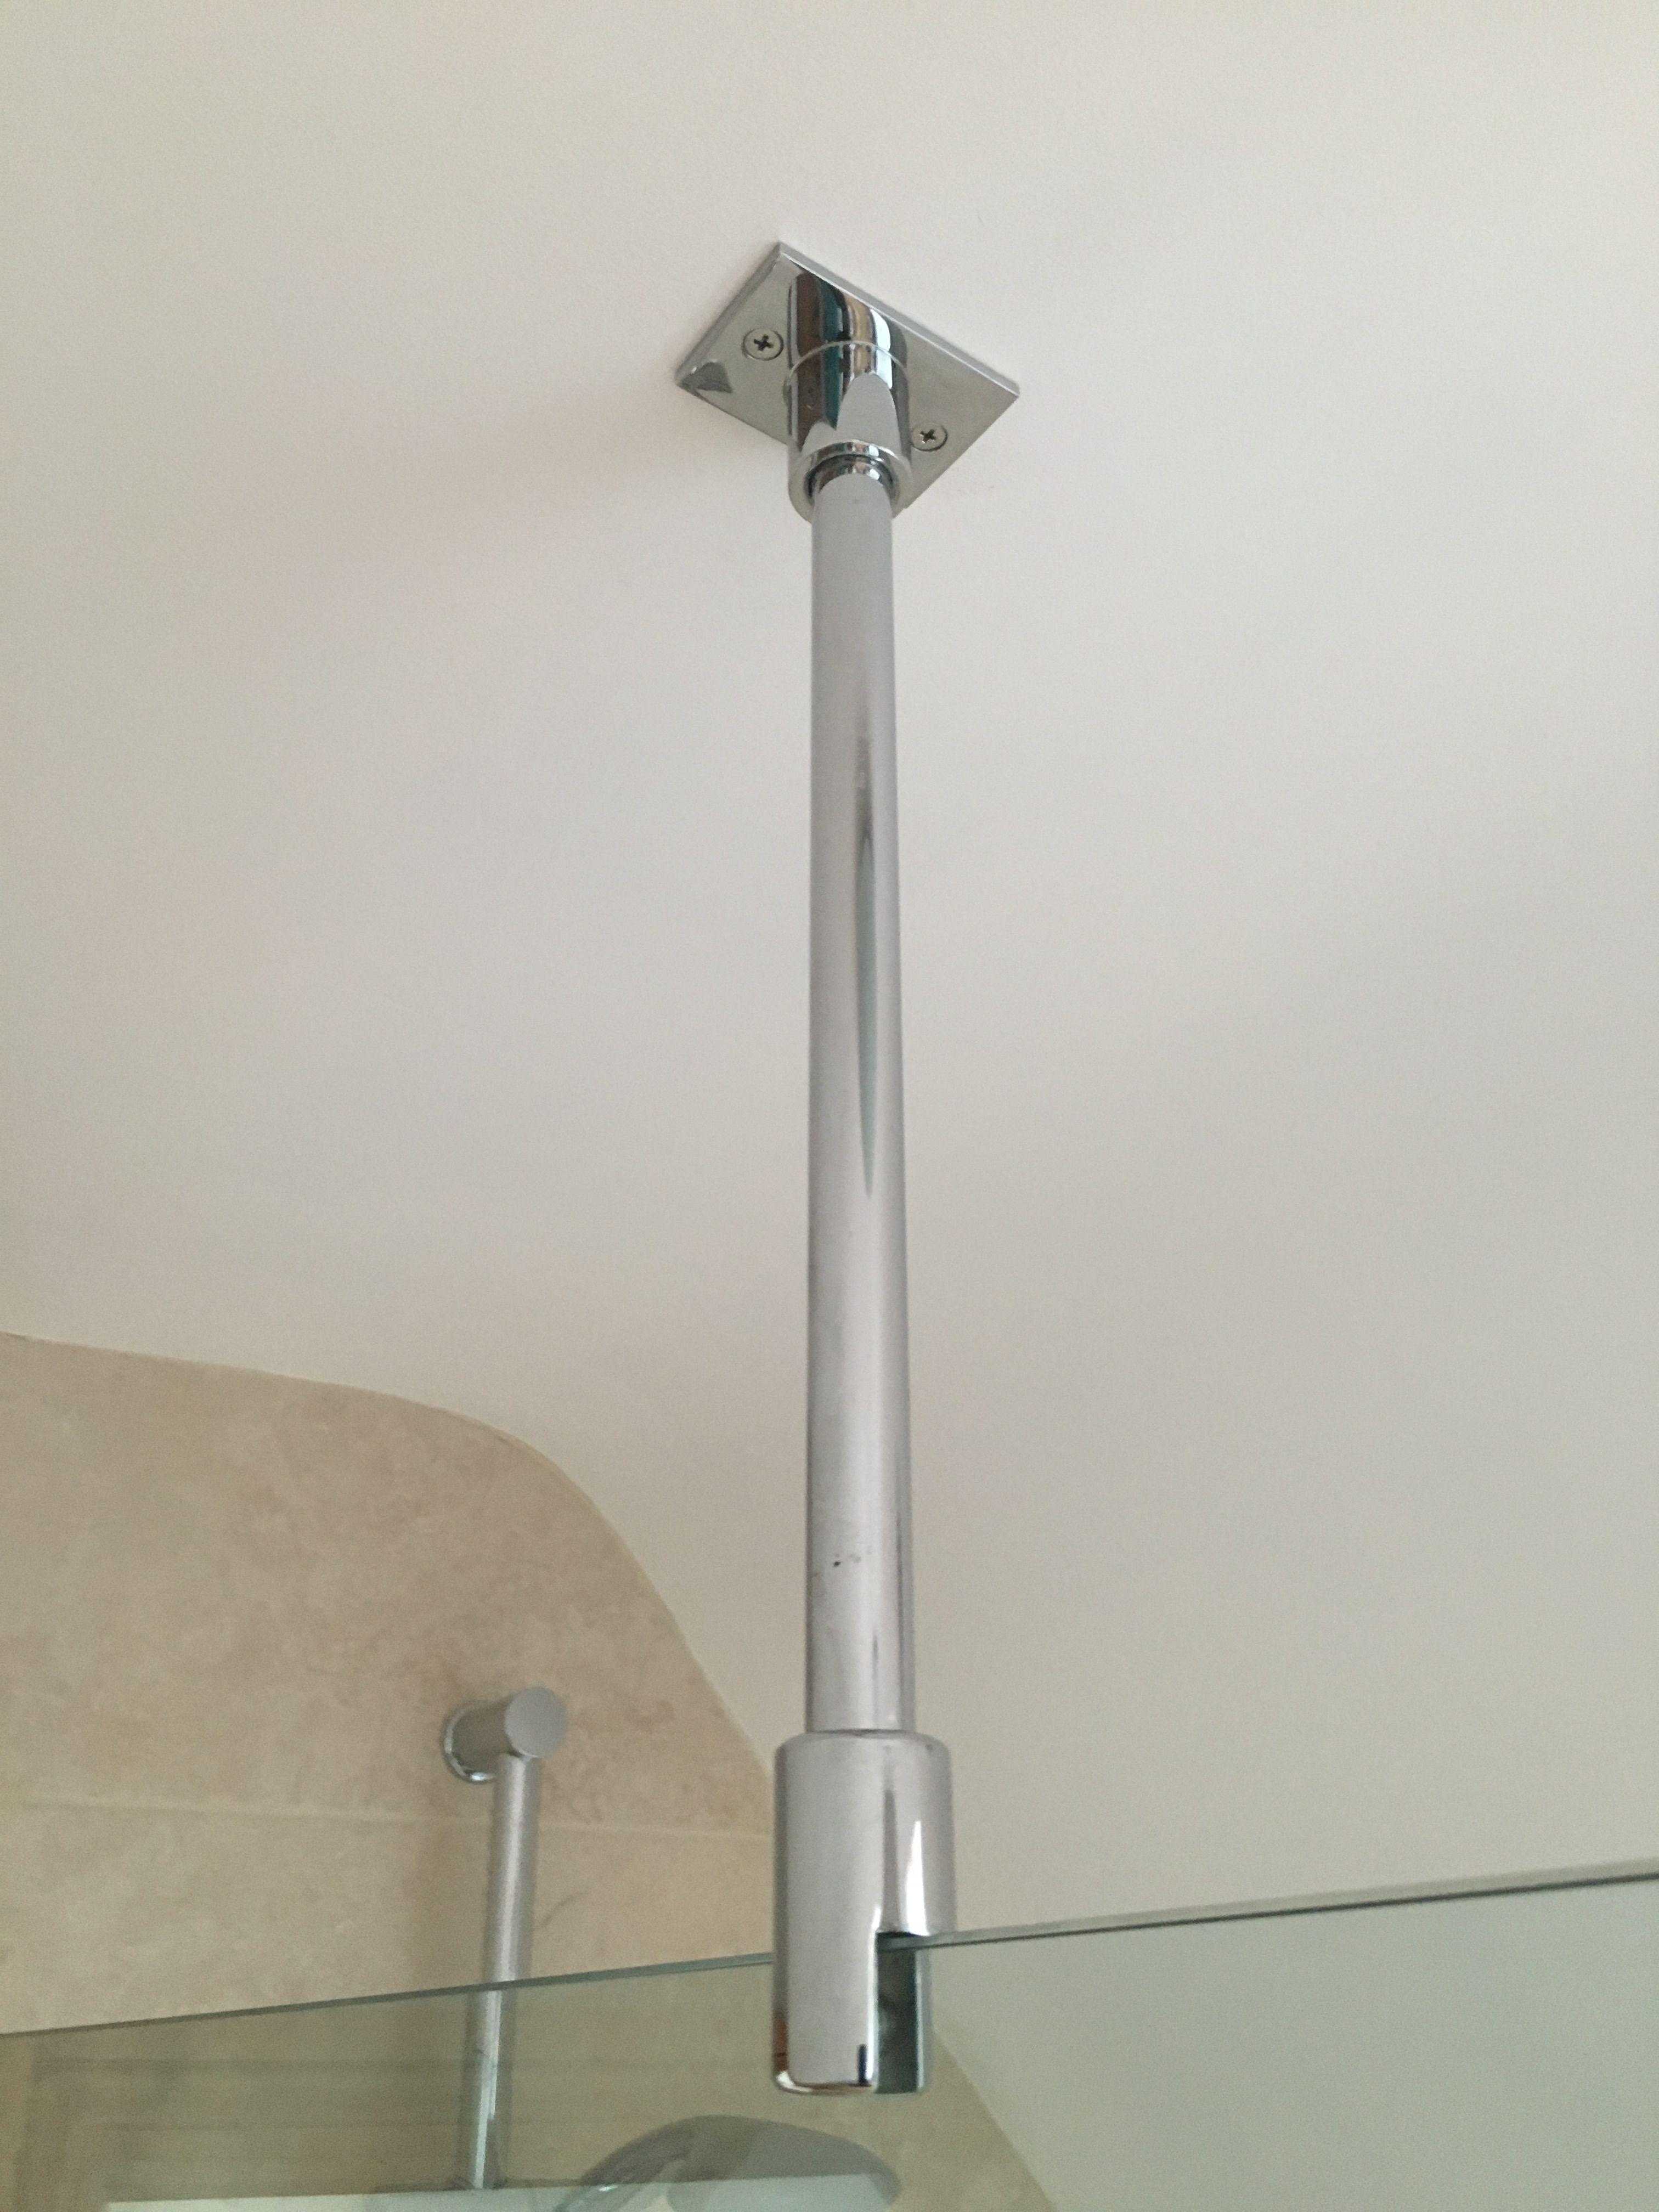 Shower Support Bar Ceiling In Chrome Glass Shower Wall Custom